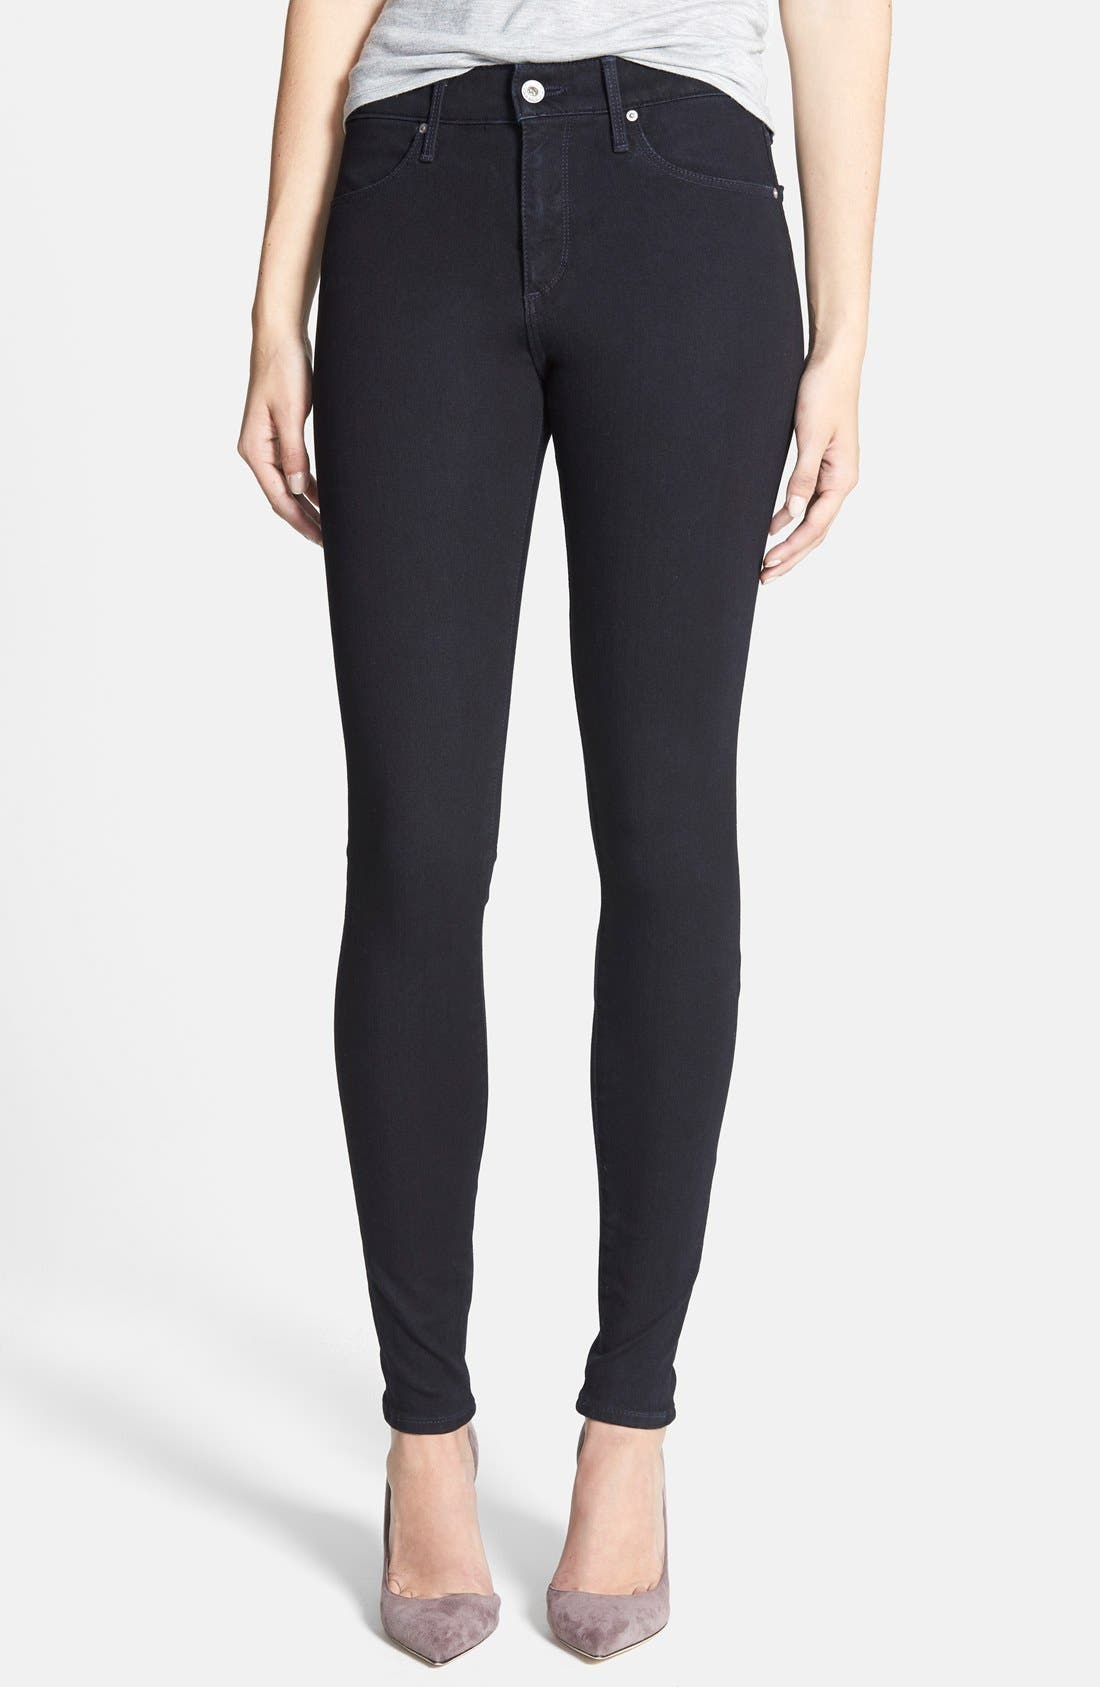 Alternate Image 1 Selected - AG Contour 360 - Farrah High Waist Skinny Jeans